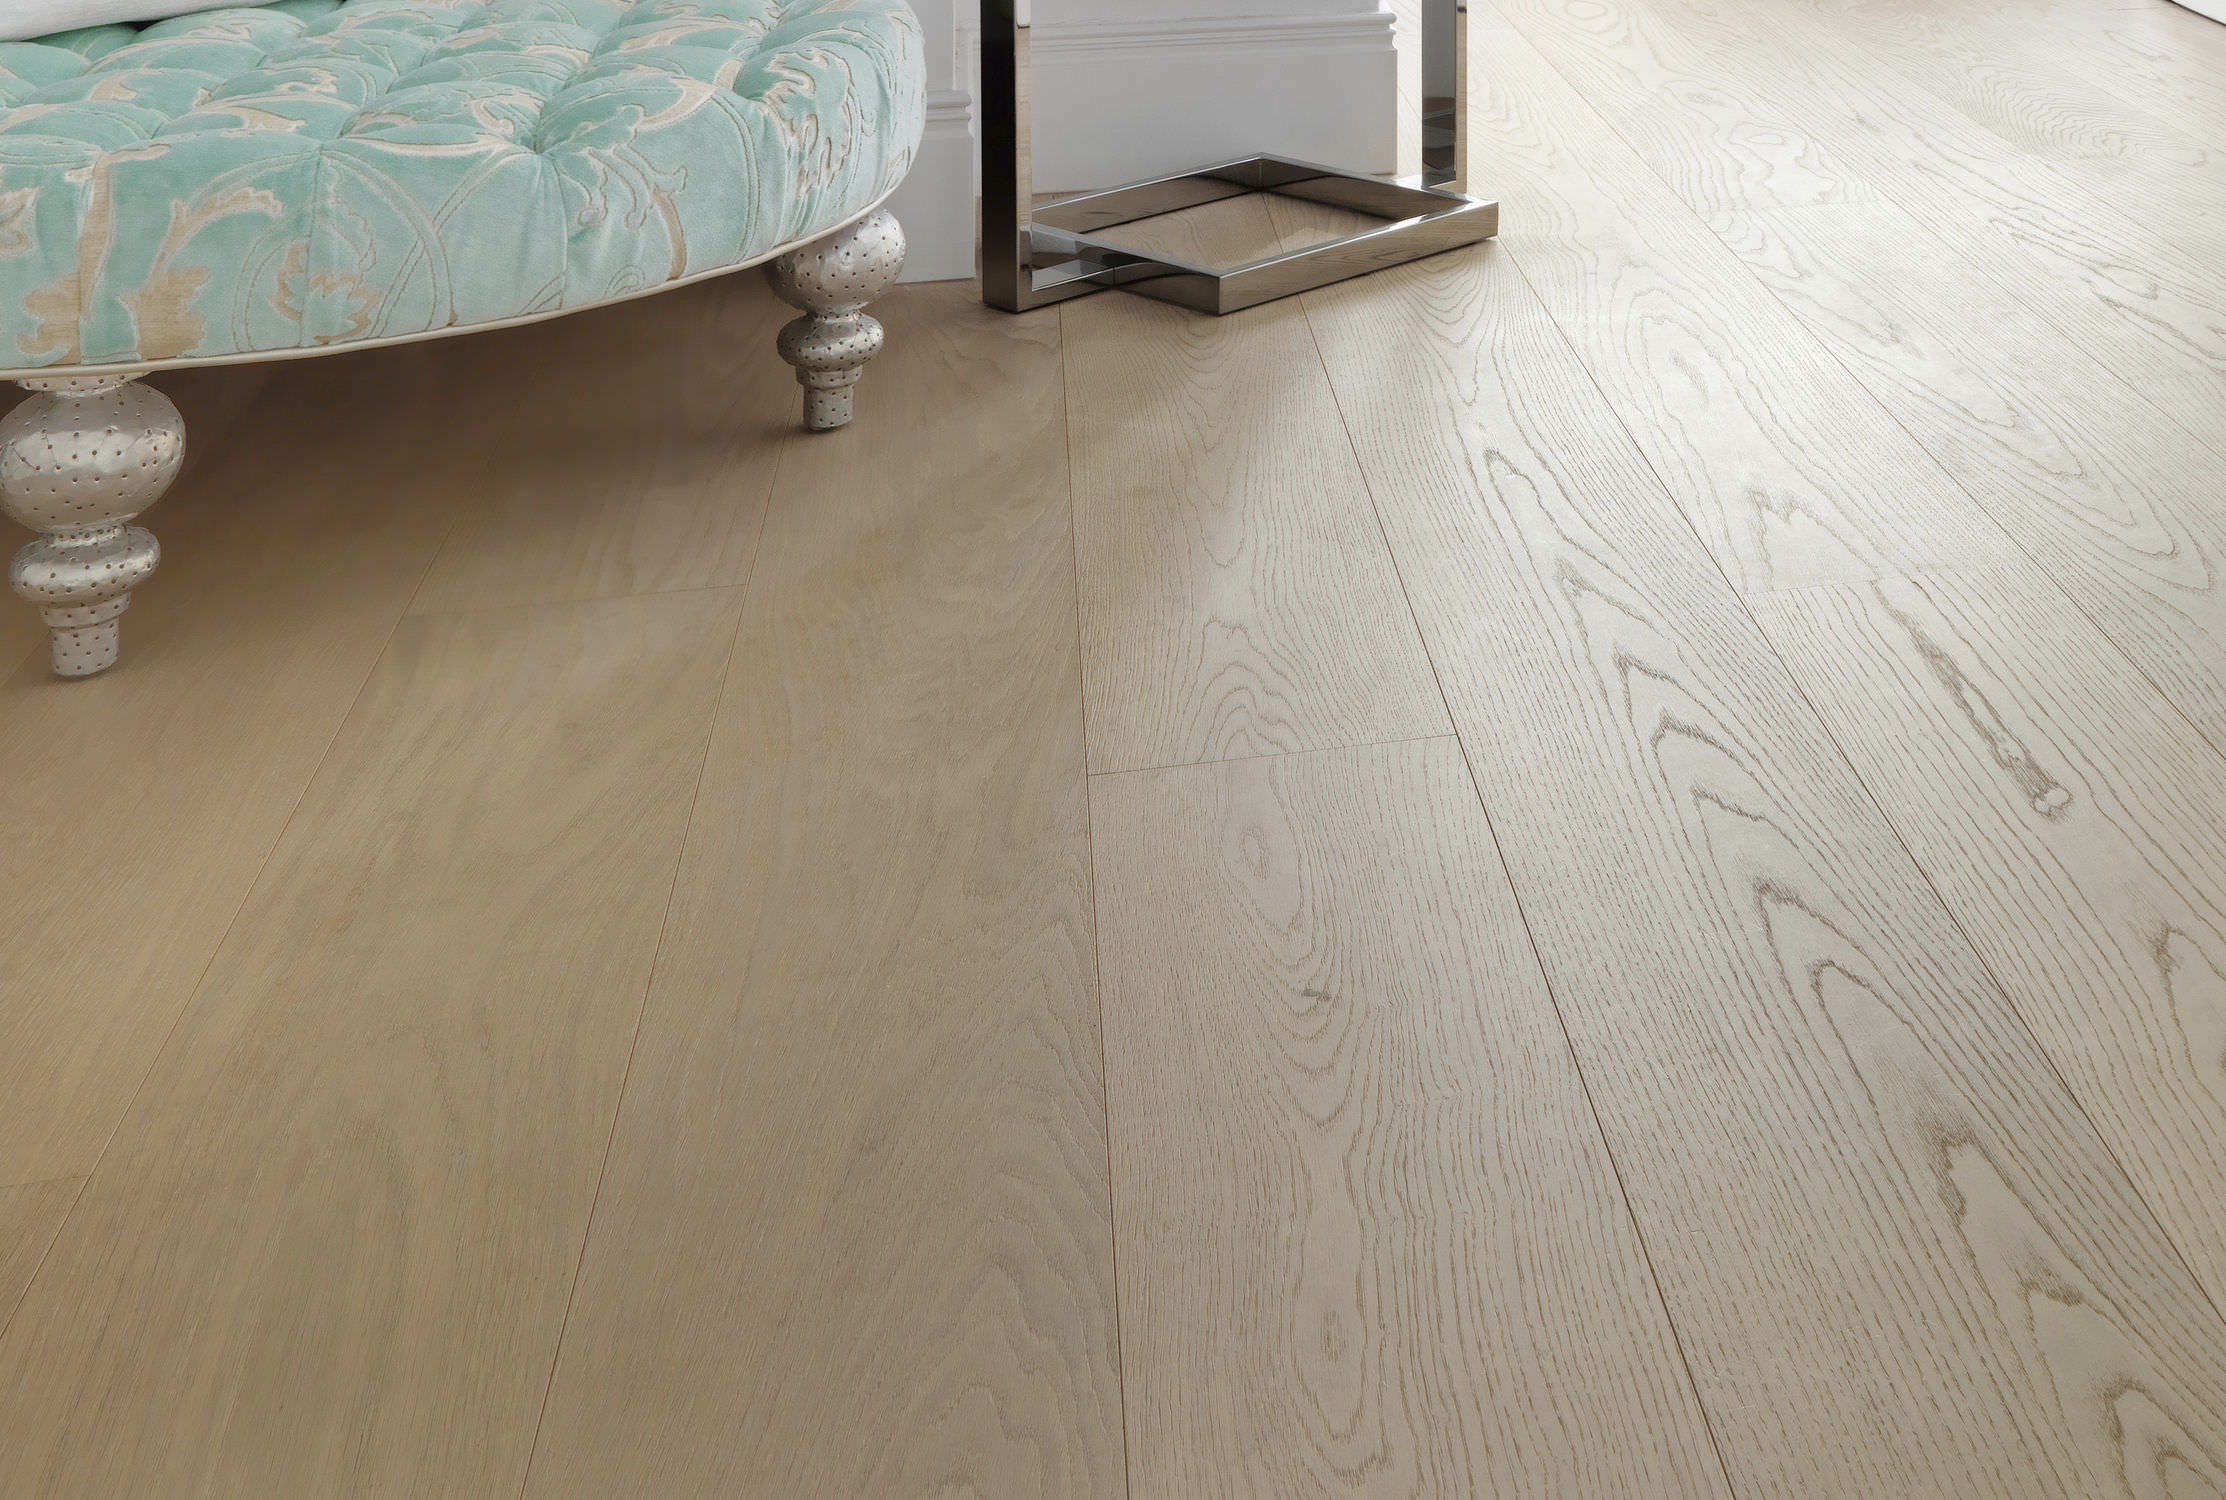 Engineered parquet floor glued floating oak OAK CLEAR WIDE